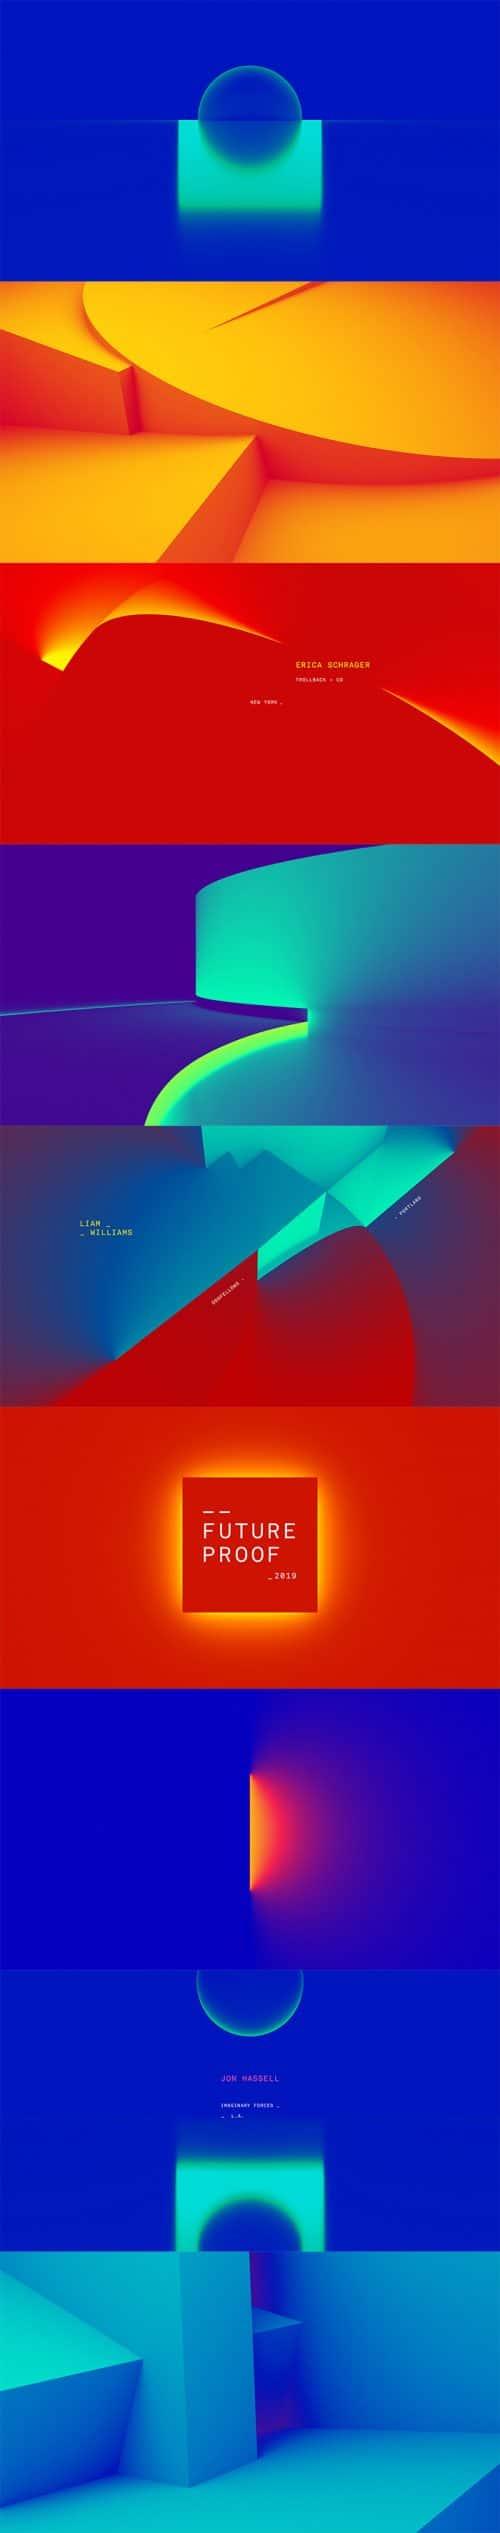 Future Proof Titles – Joshua Galindo